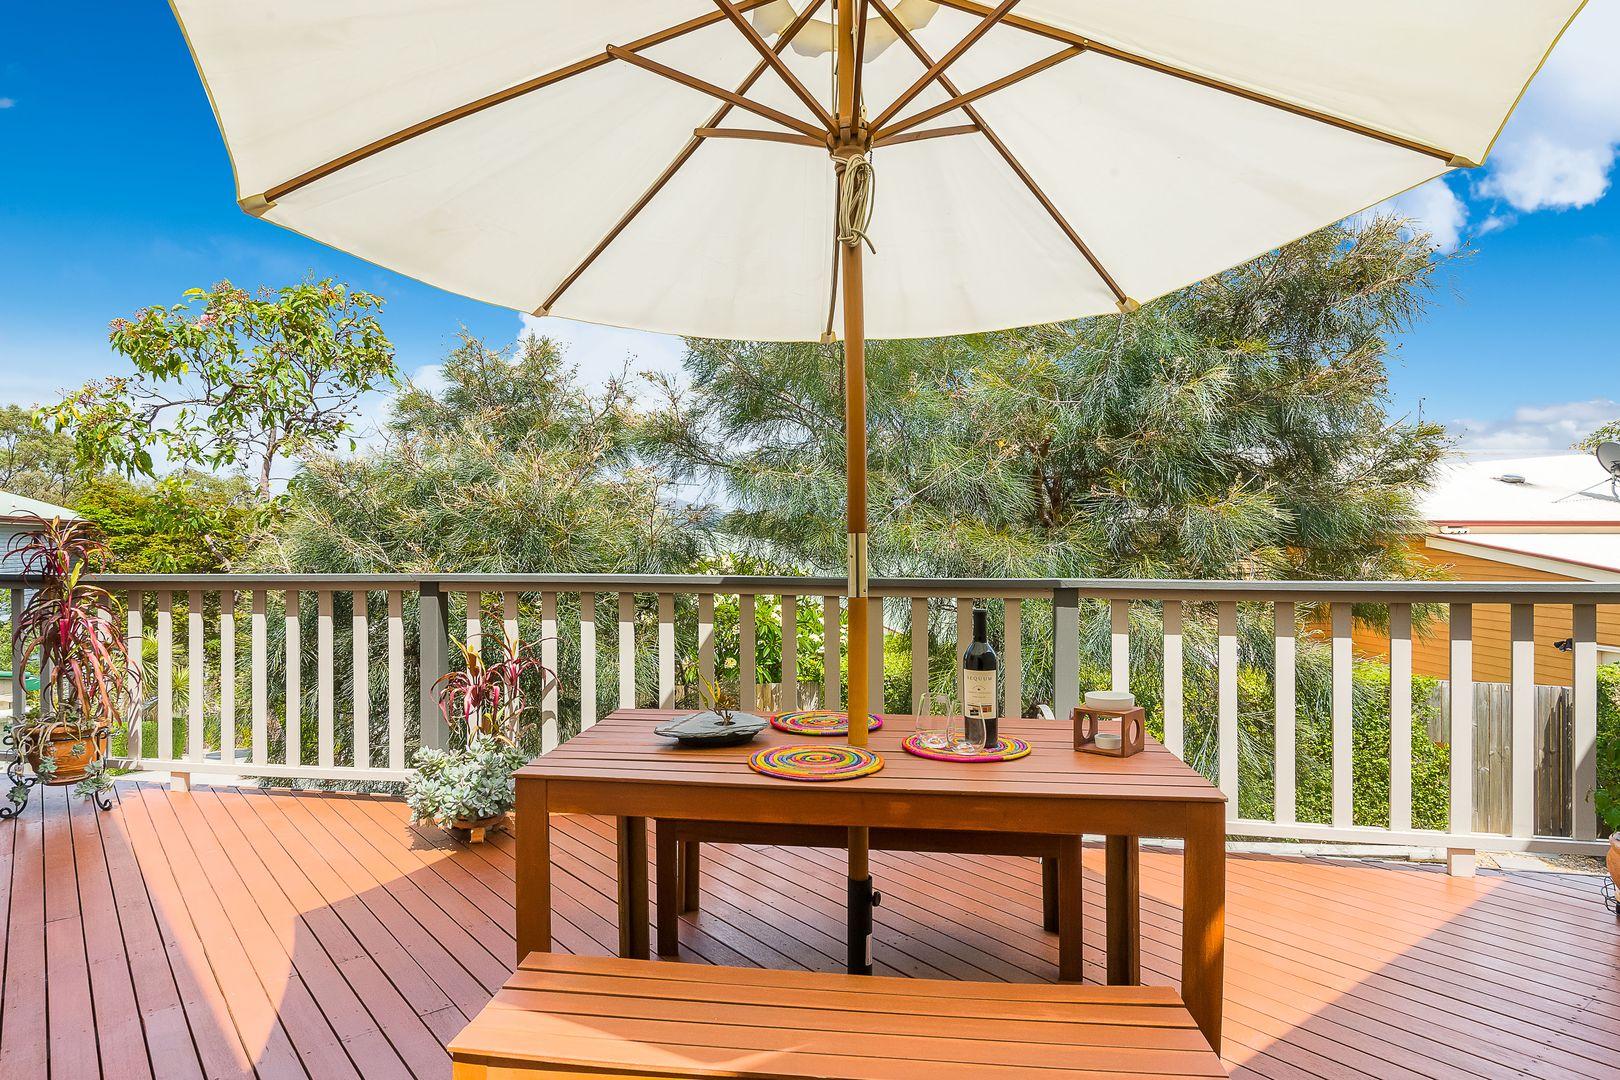 9/976 Samford  Road, Keperra QLD 4054, Image 0